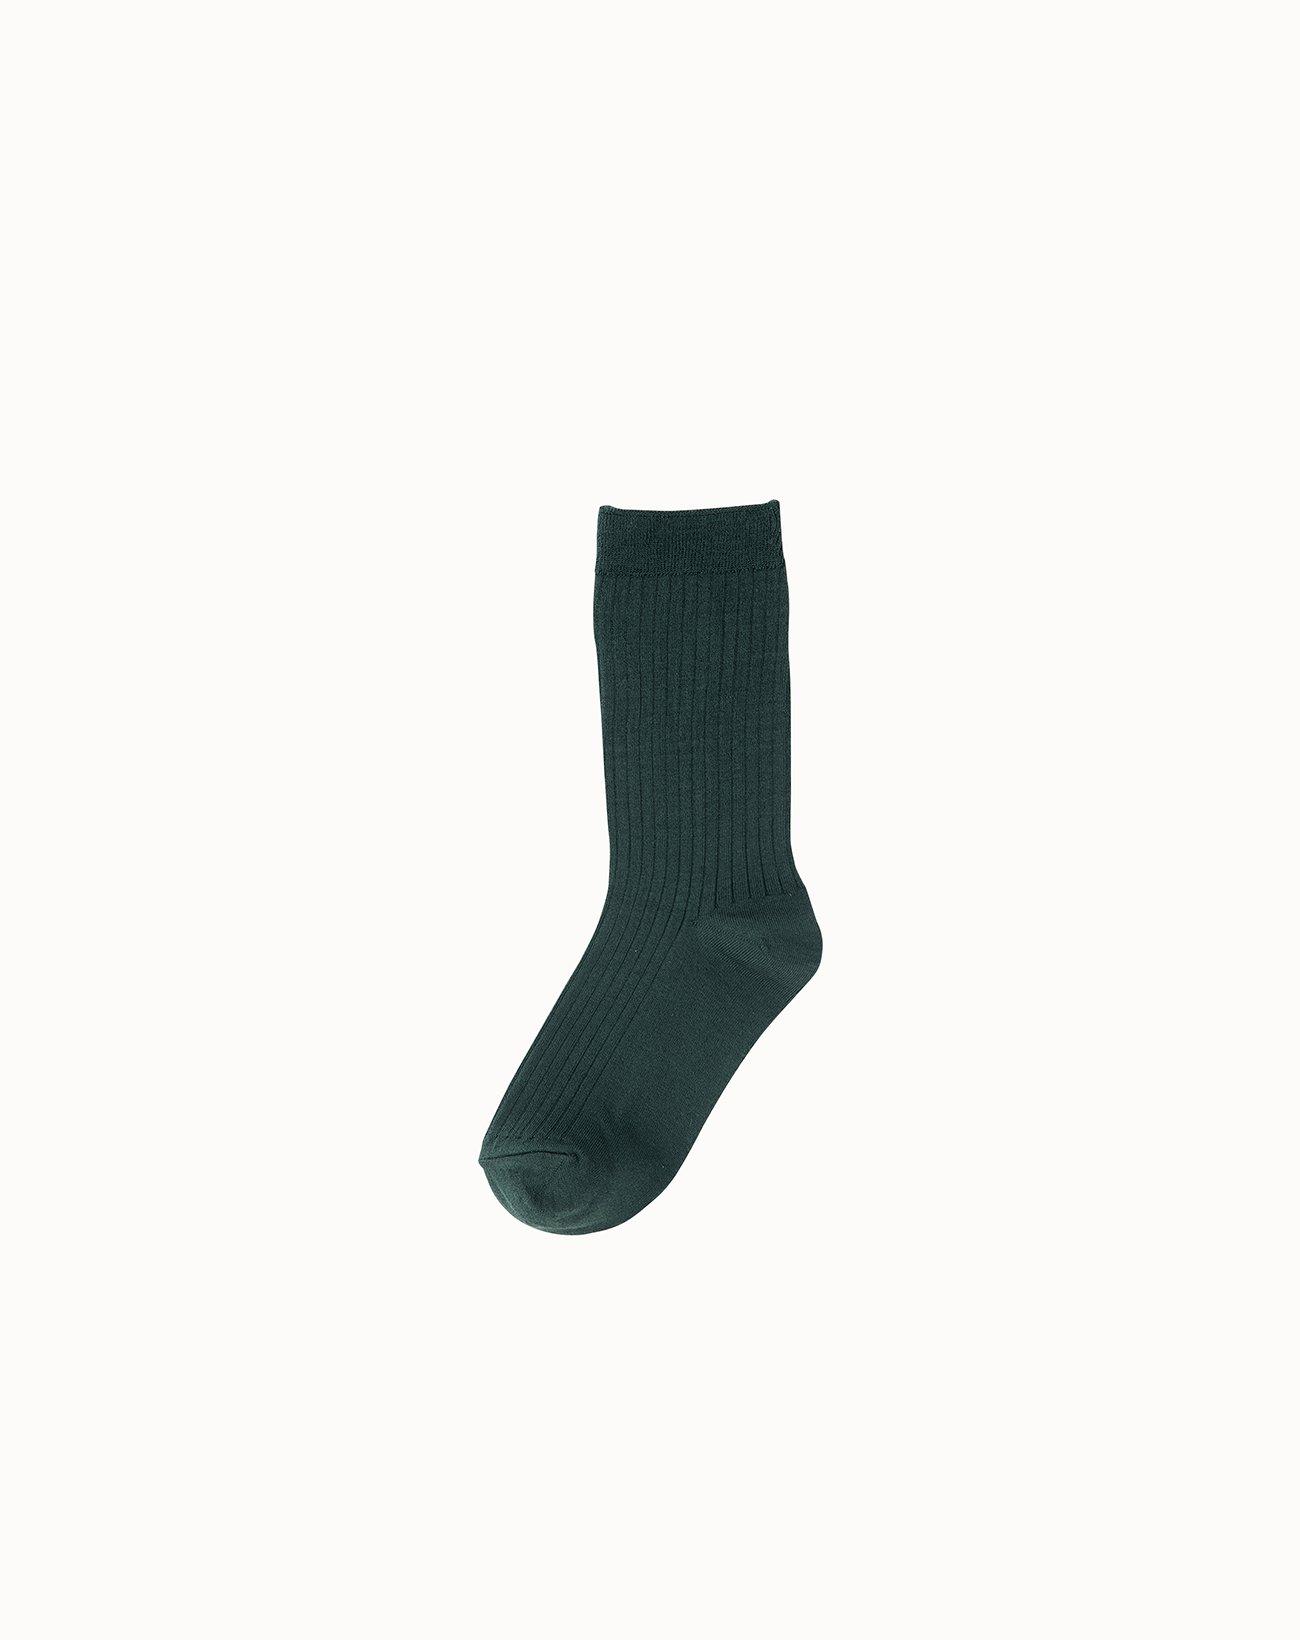 leur logette - Silk Rib Socks - Green